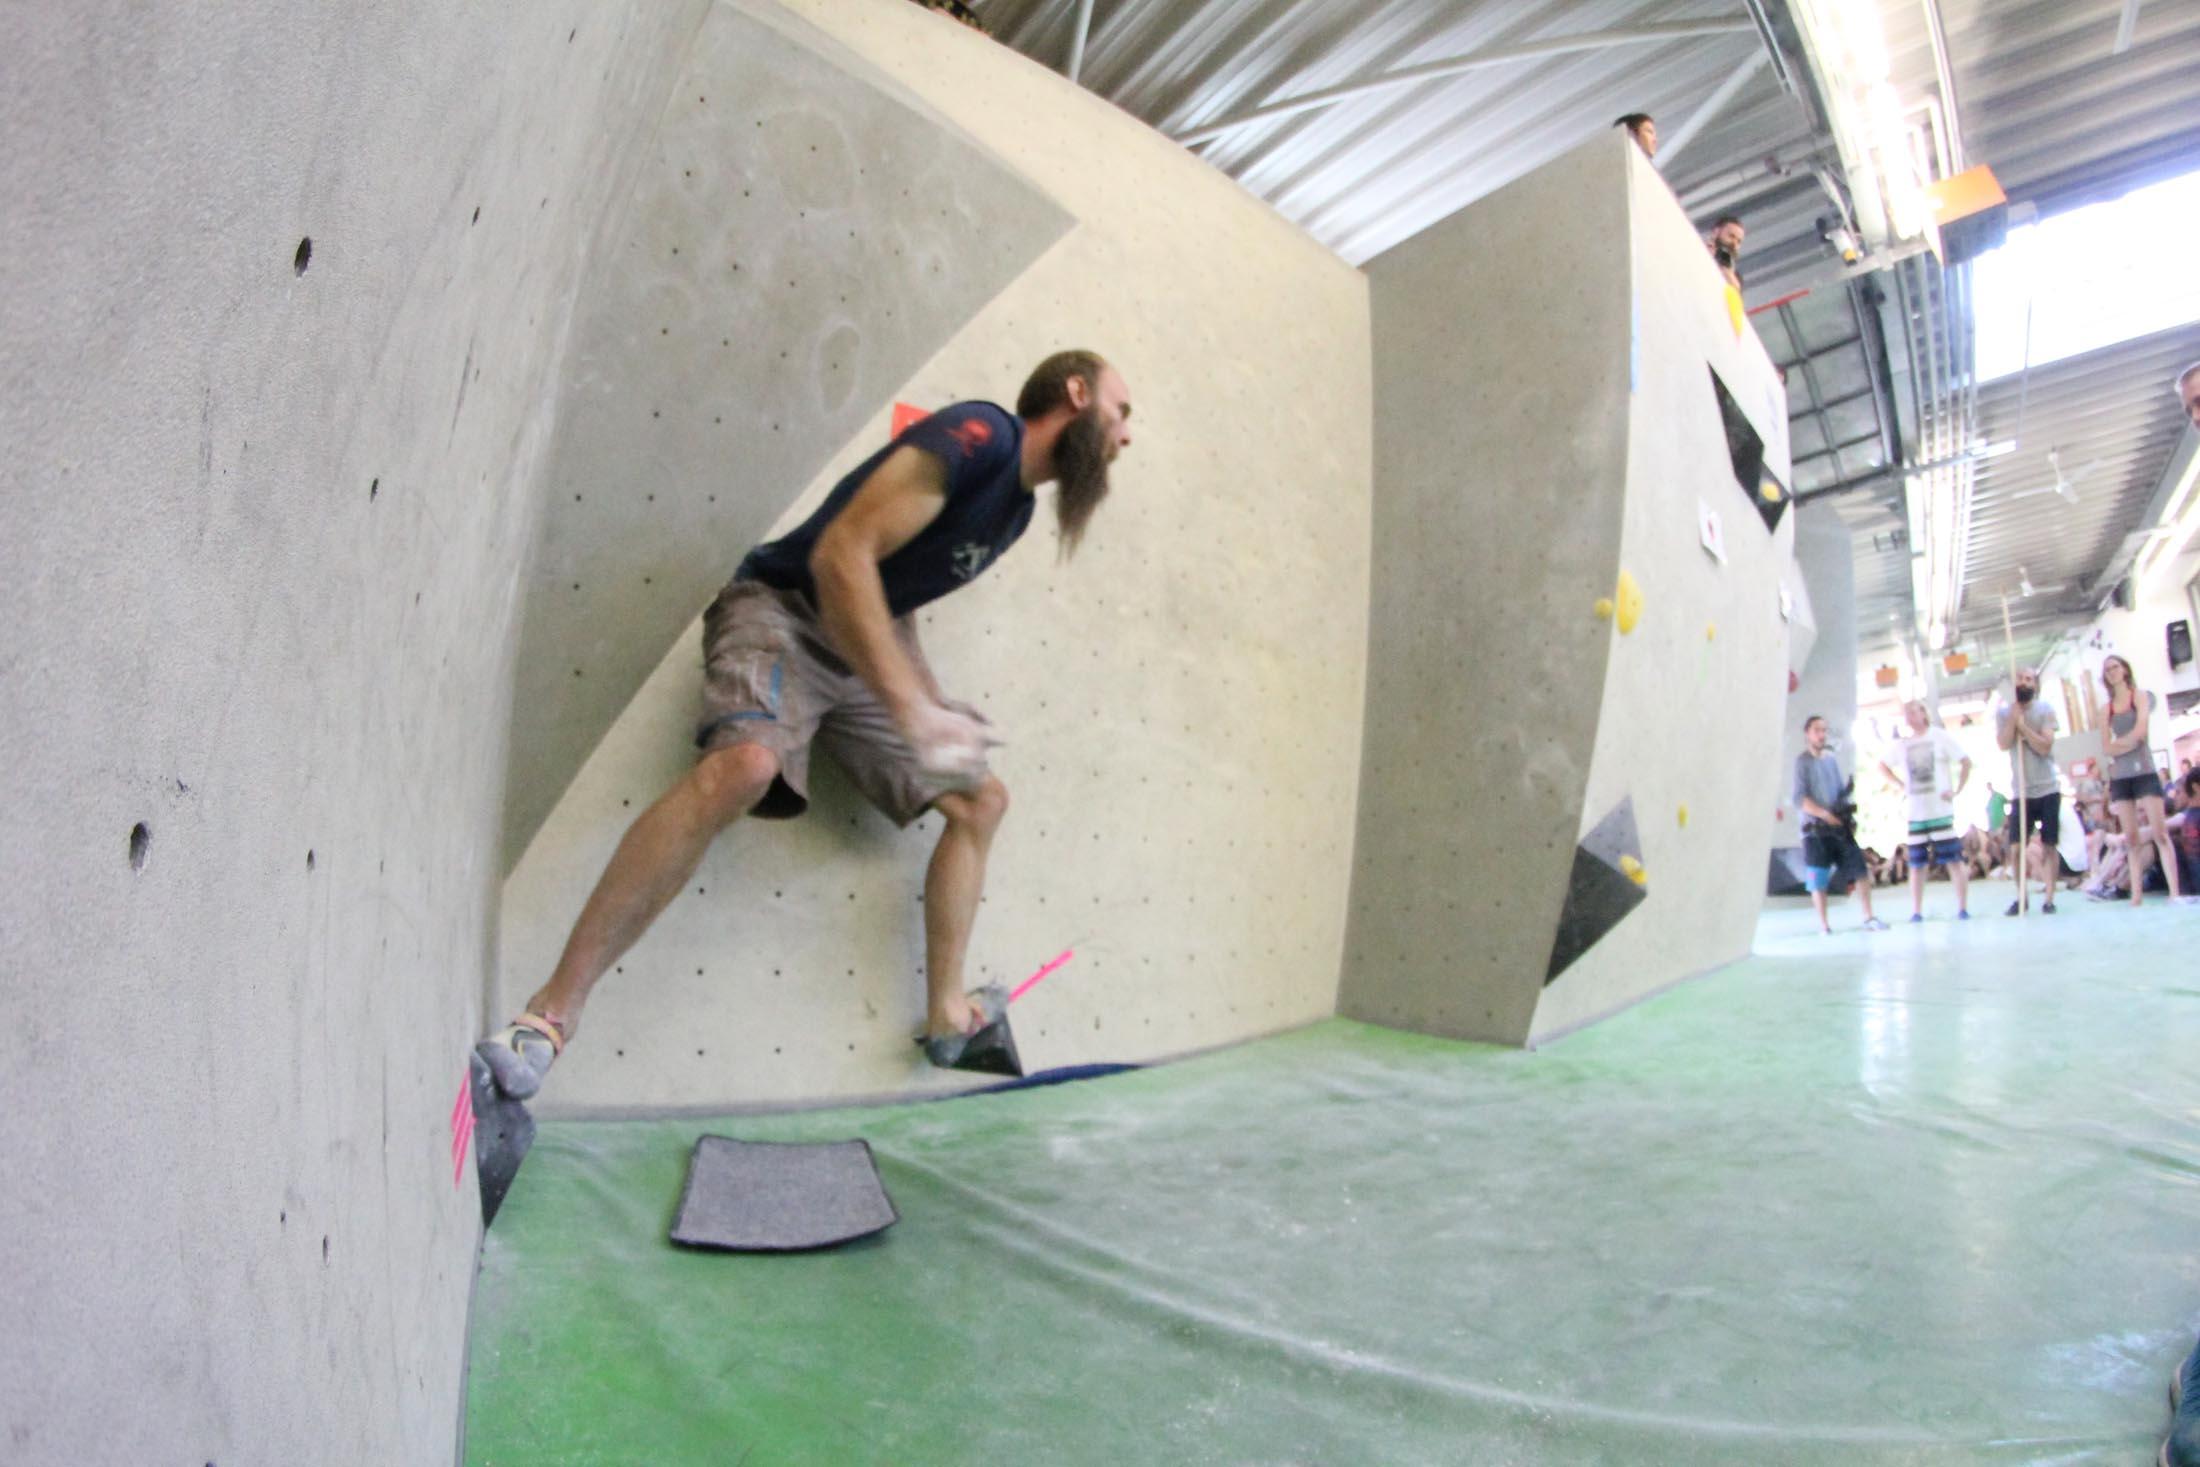 Finale, internationaler bouldercup Frankenjura 2016, BLOCKHELDEN Erlangen, Mammut, Bergfreunde.de, Boulderwettkampf07092016539